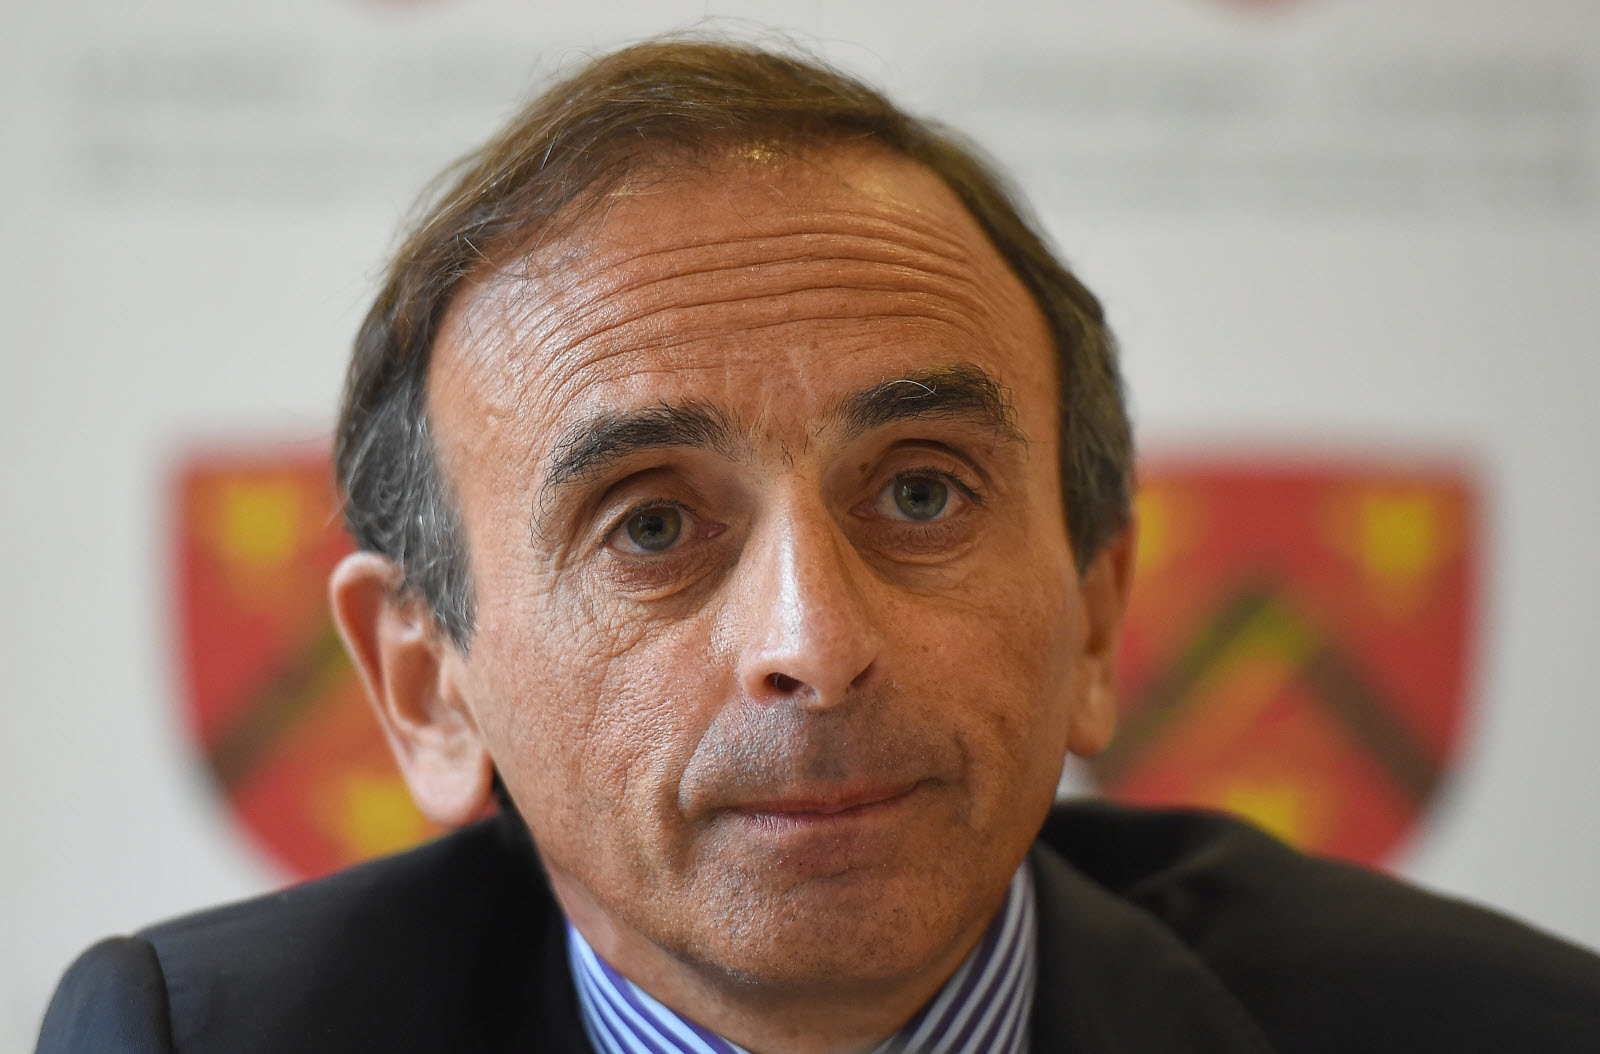 France S Eric Zemmour Naming Child Mohammed Invites Discrimination